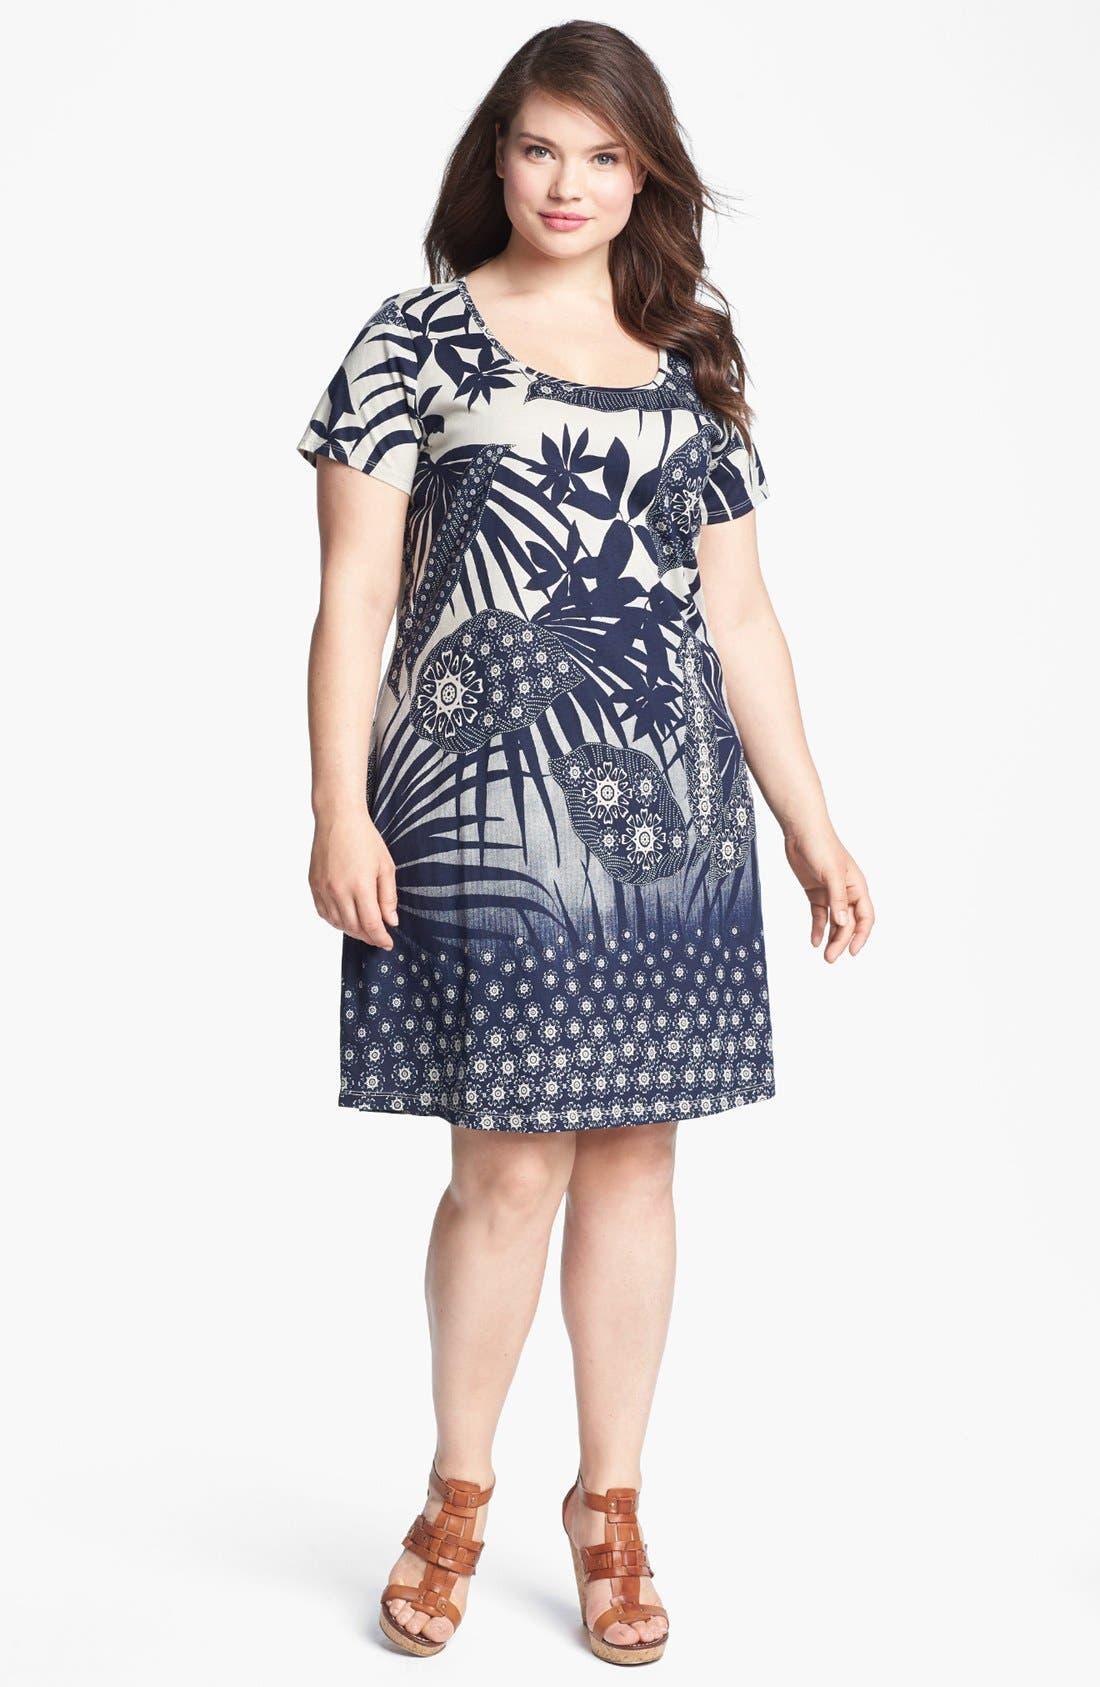 Main Image - Lucky Brand 'Chantal' Print Cotton Dress (Plus Size)